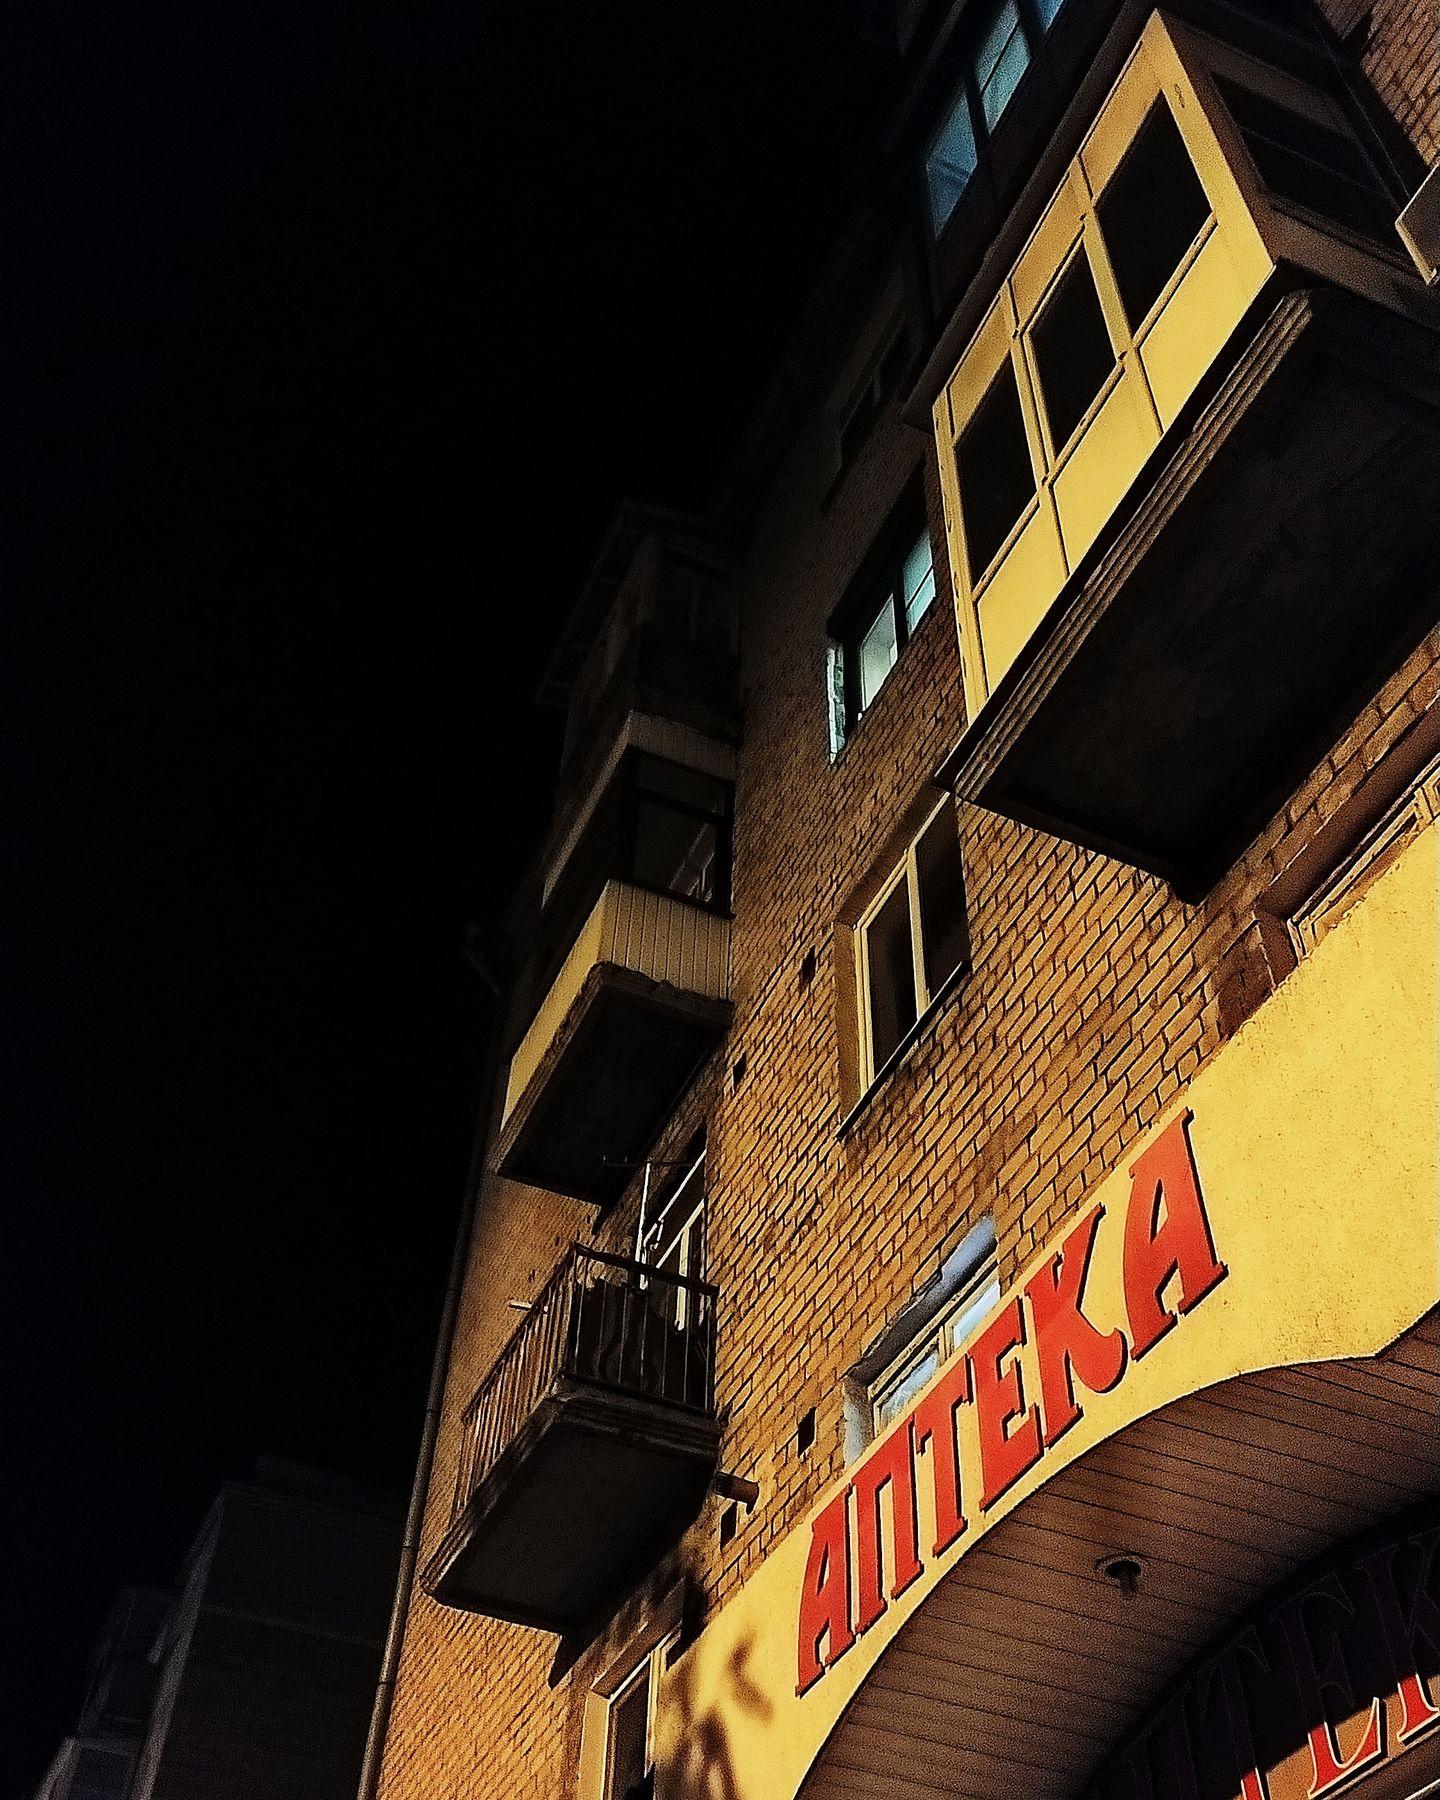 ночь.аптека ночь аптека город